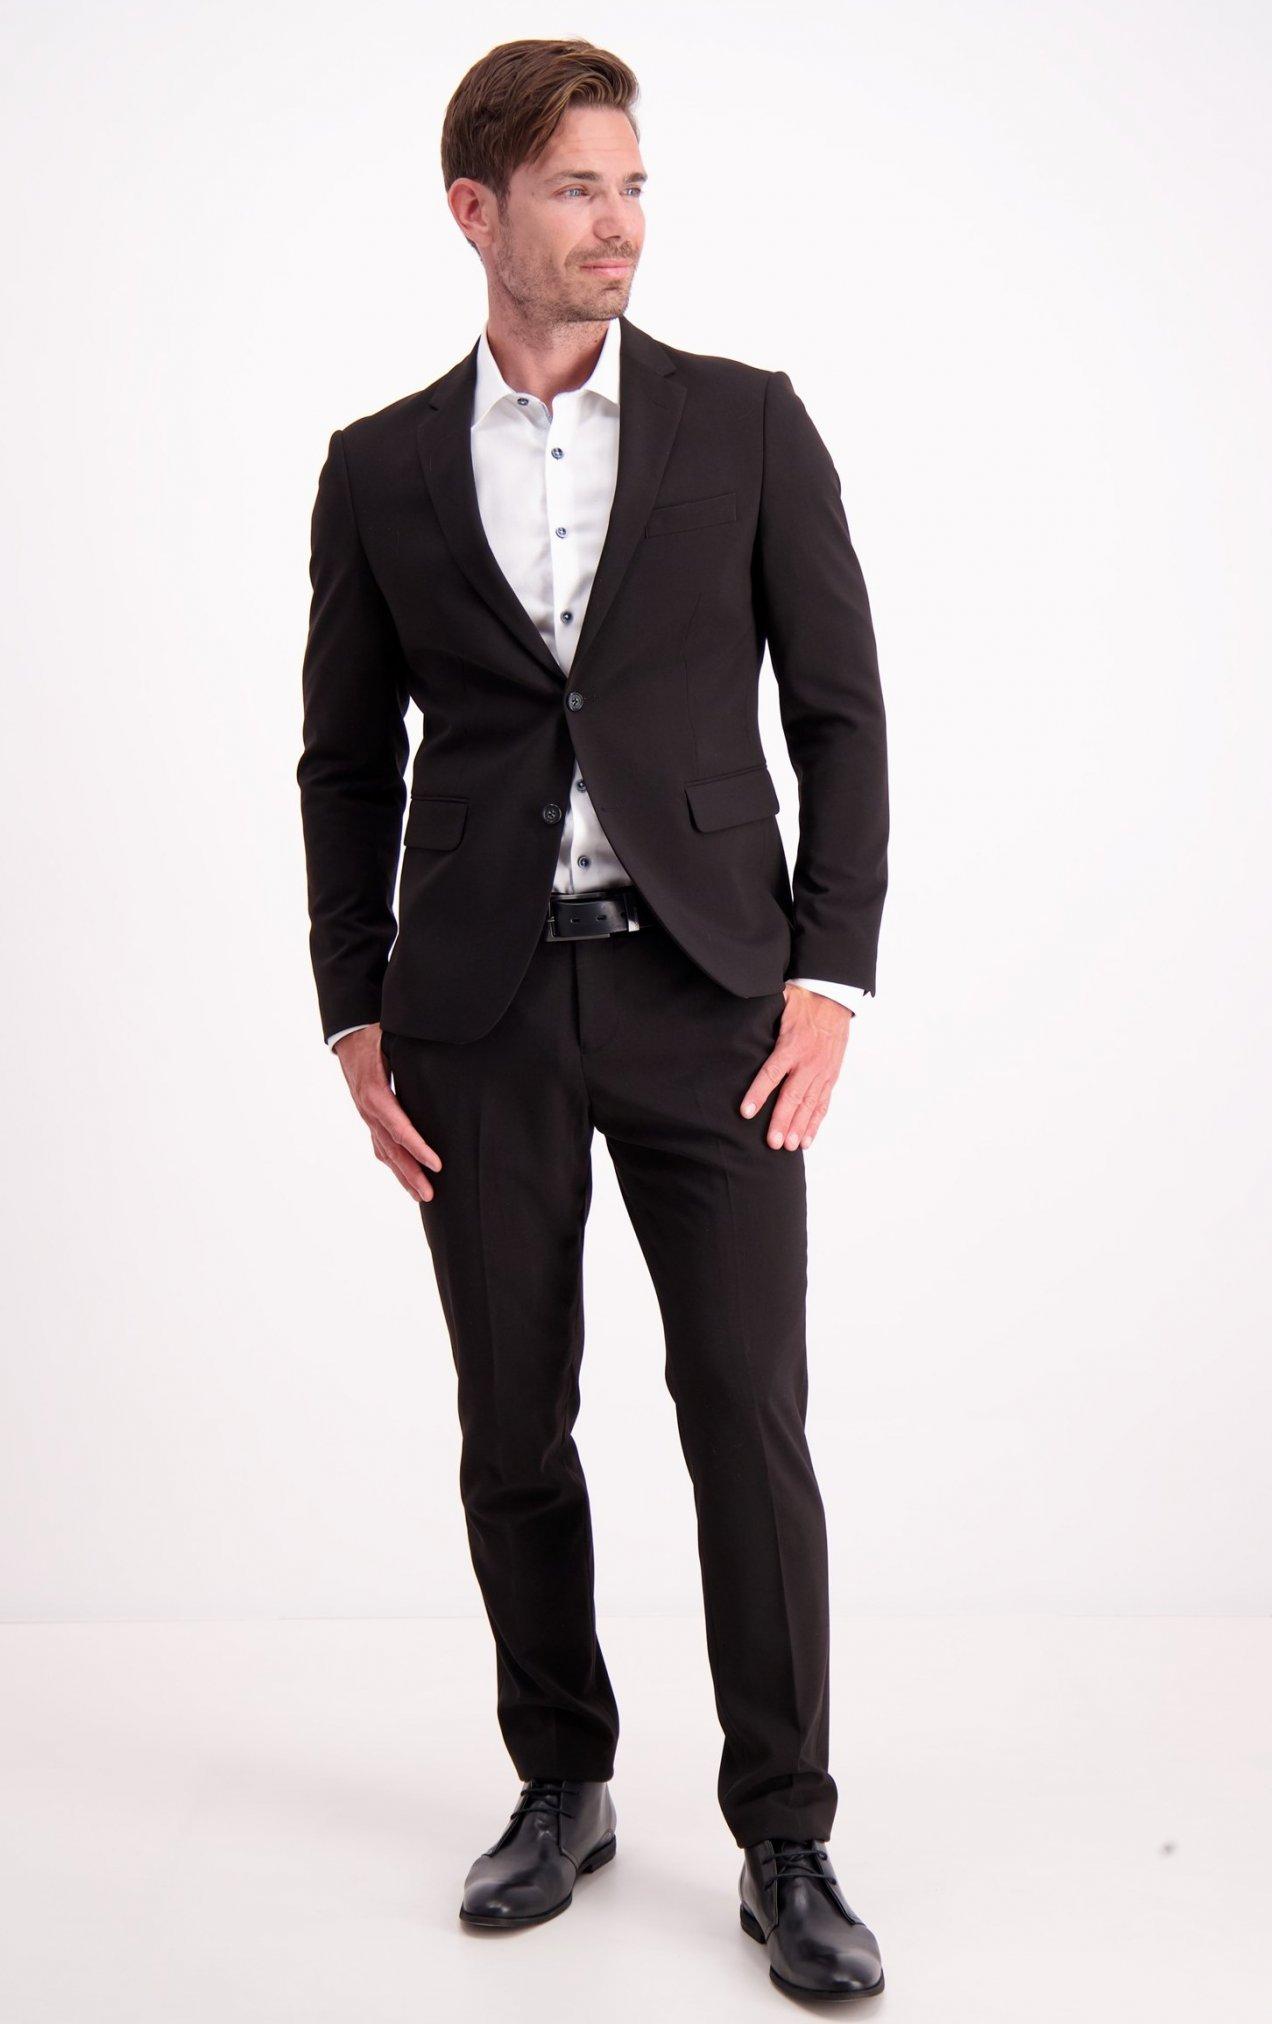 Lindbergh - Kostym 30-61040 - Killkläder - Mintfashion.se 9158a5a69747e